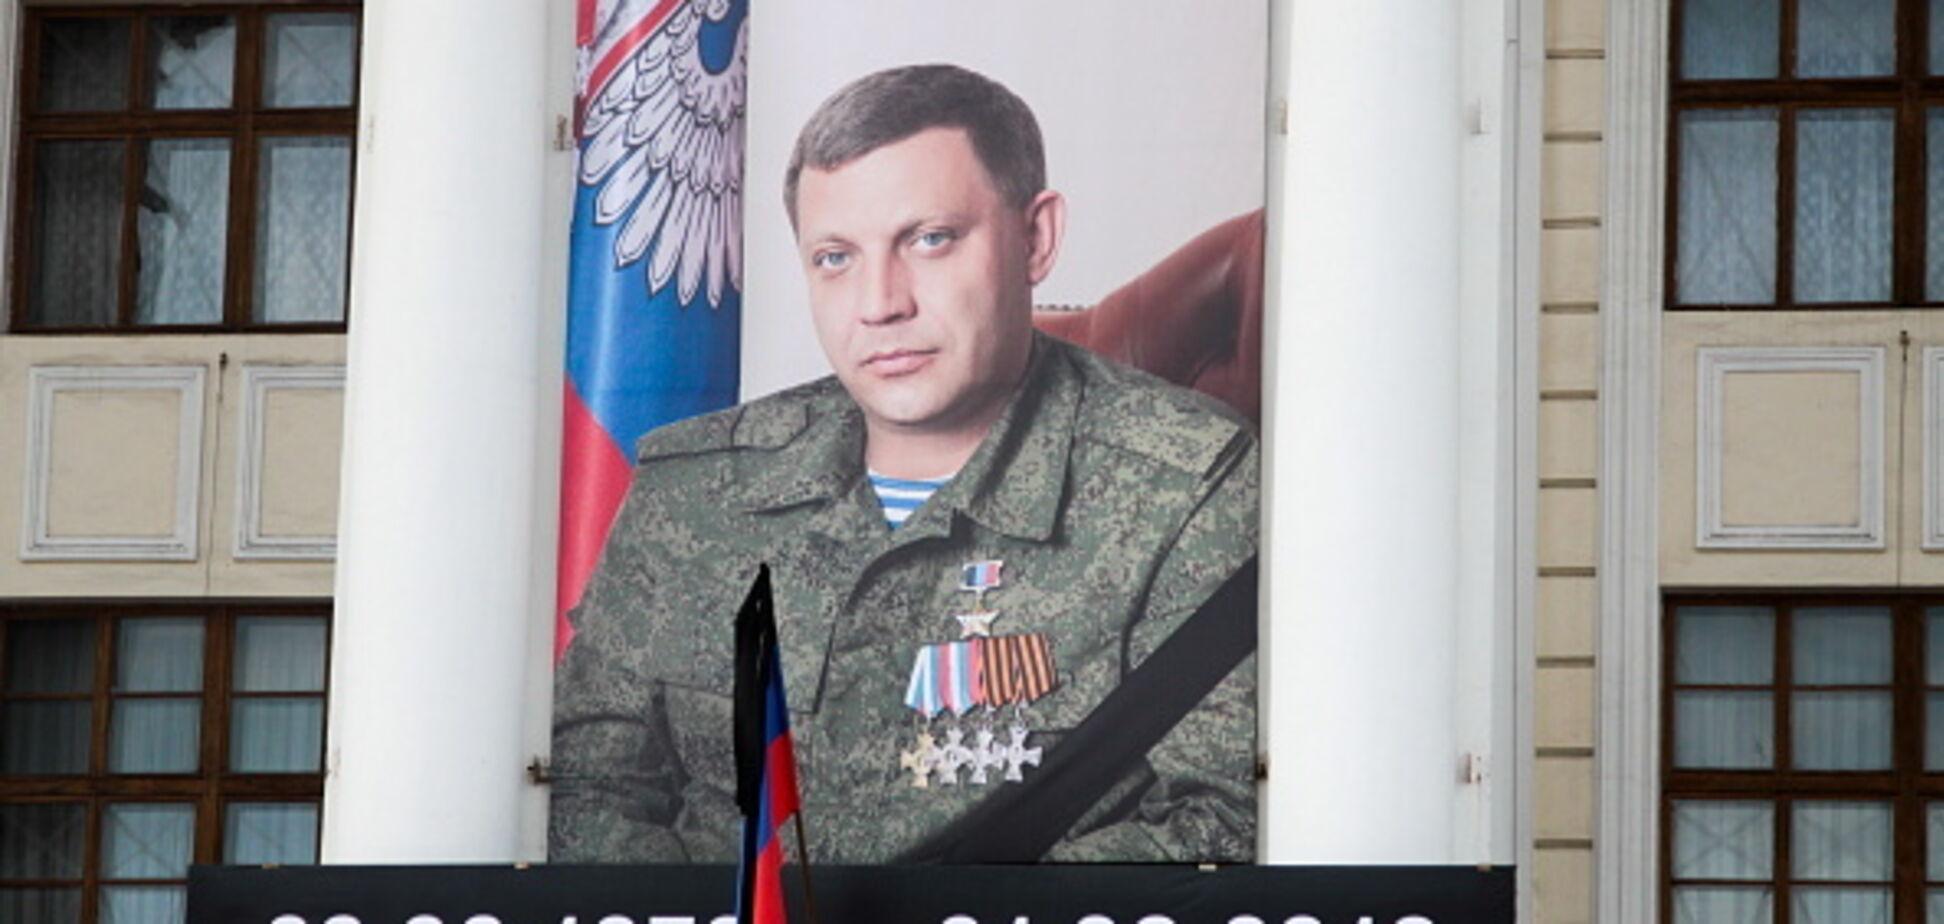 Захарченко убили свои: любимая газета Путина разразилась 'сенсацией'